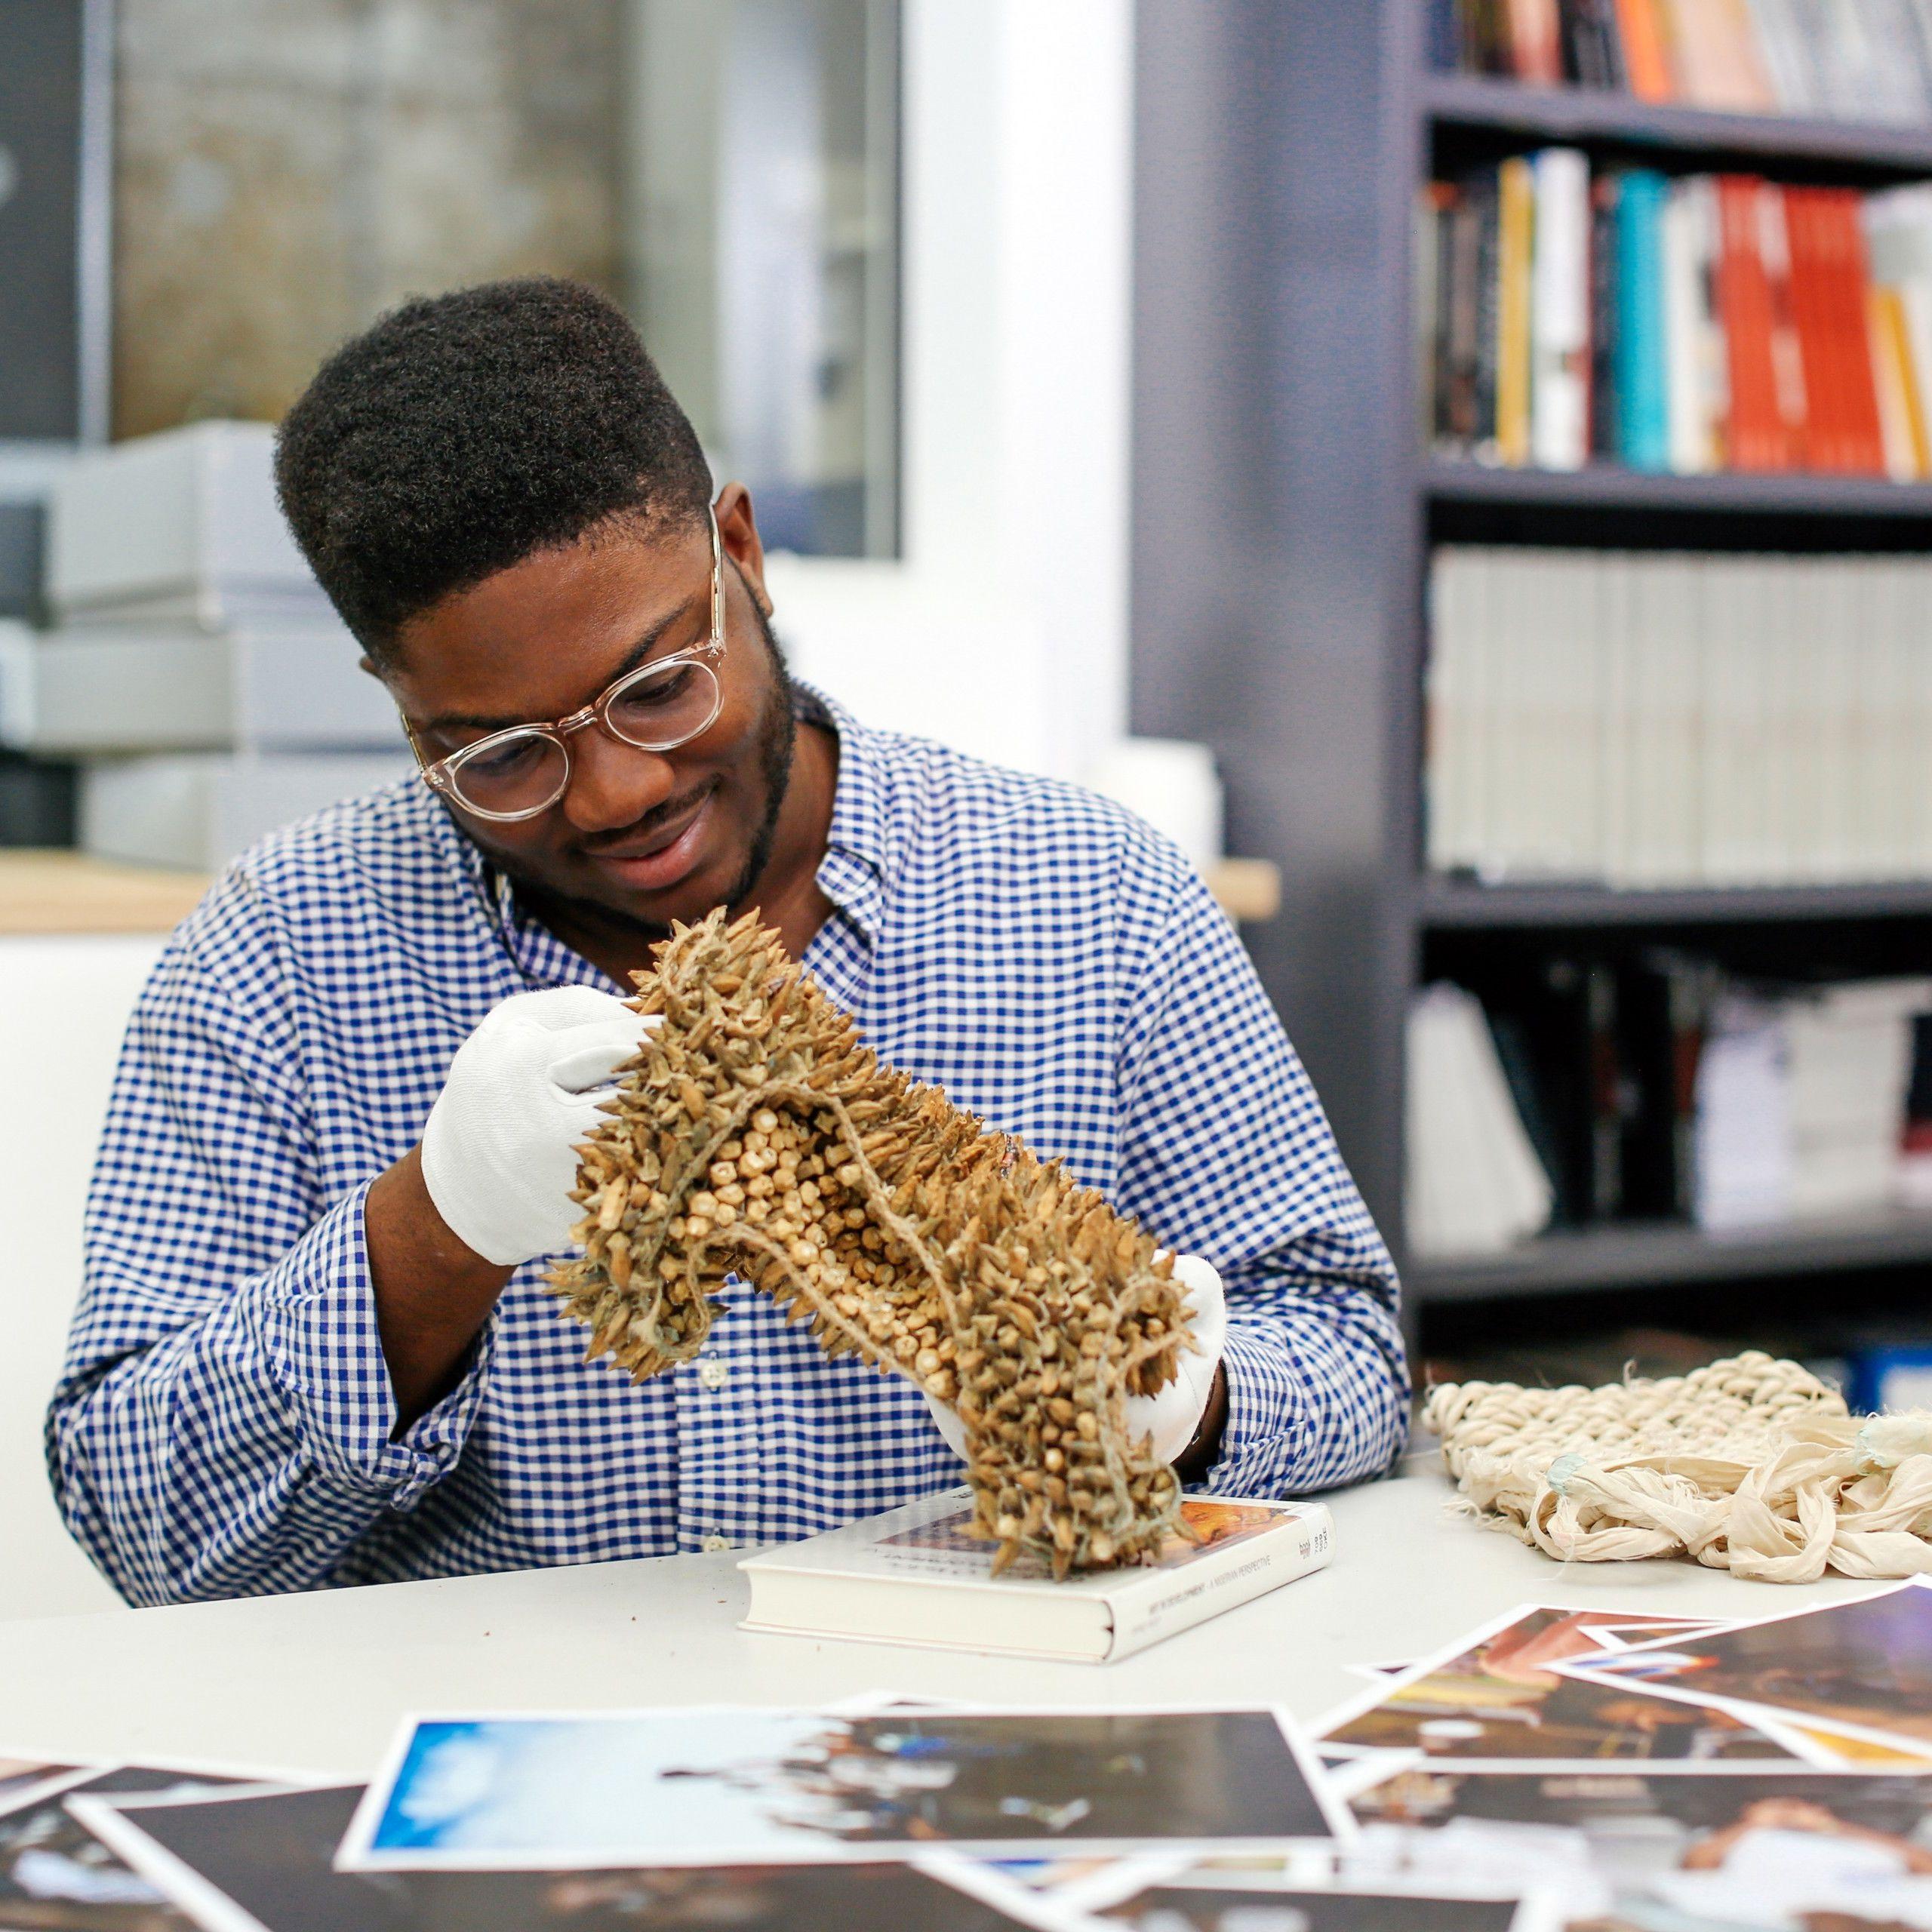 Student creating a sculpture at a desk